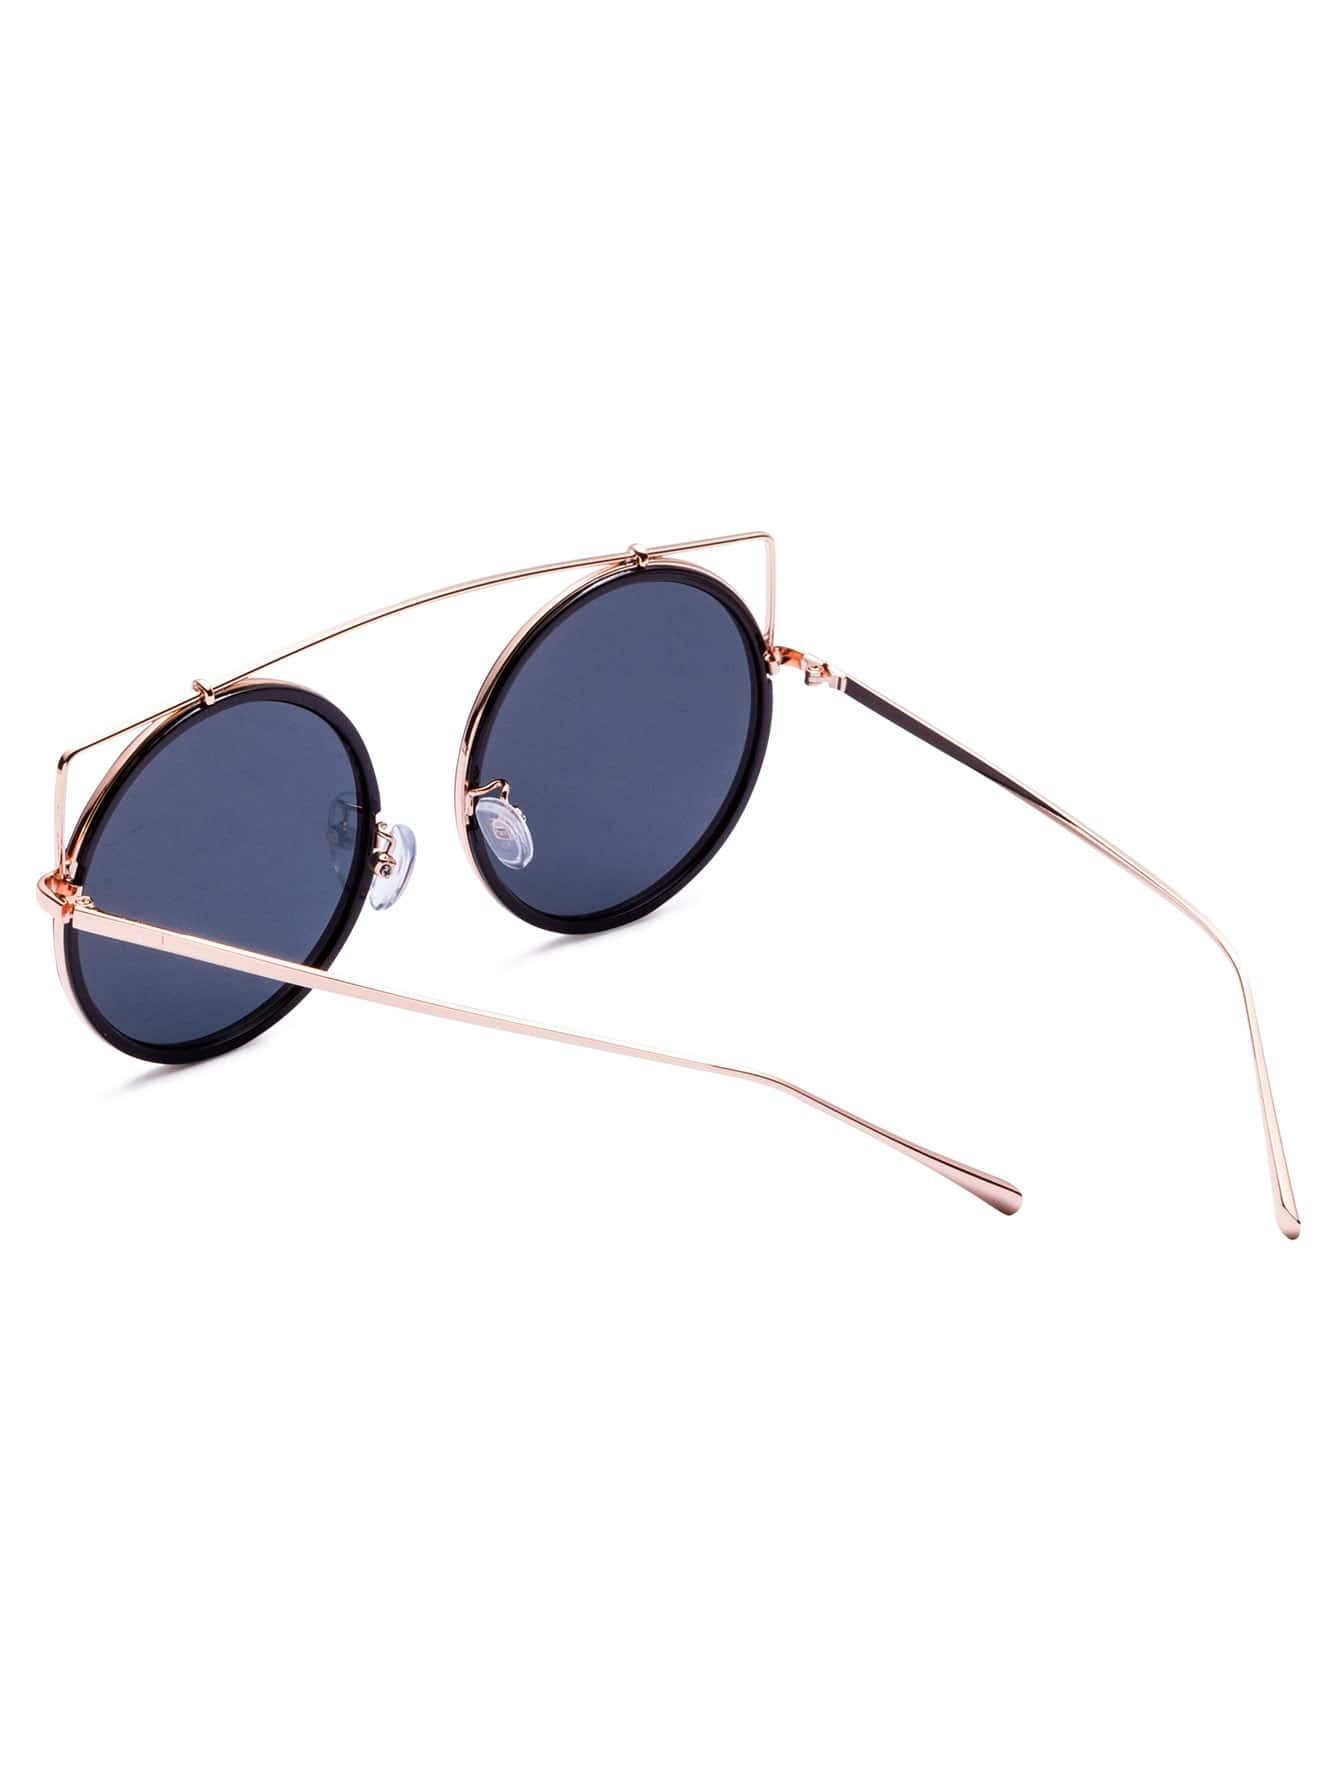 lunettes de soleil en or gris lunette ronde french romwe. Black Bedroom Furniture Sets. Home Design Ideas